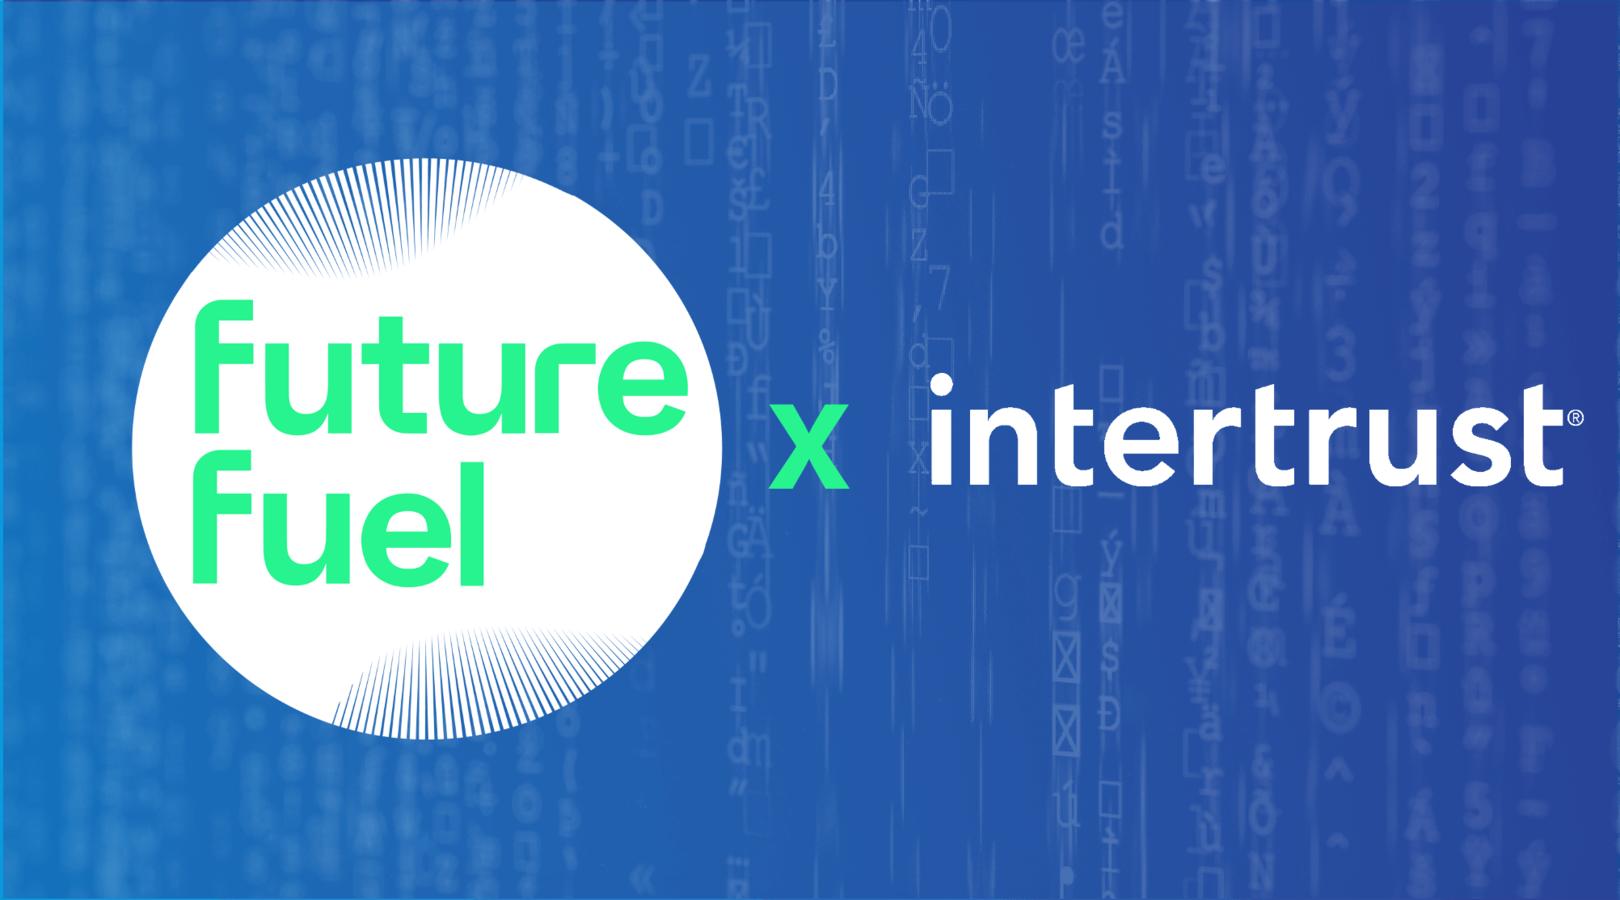 Future fuel X Intertrust